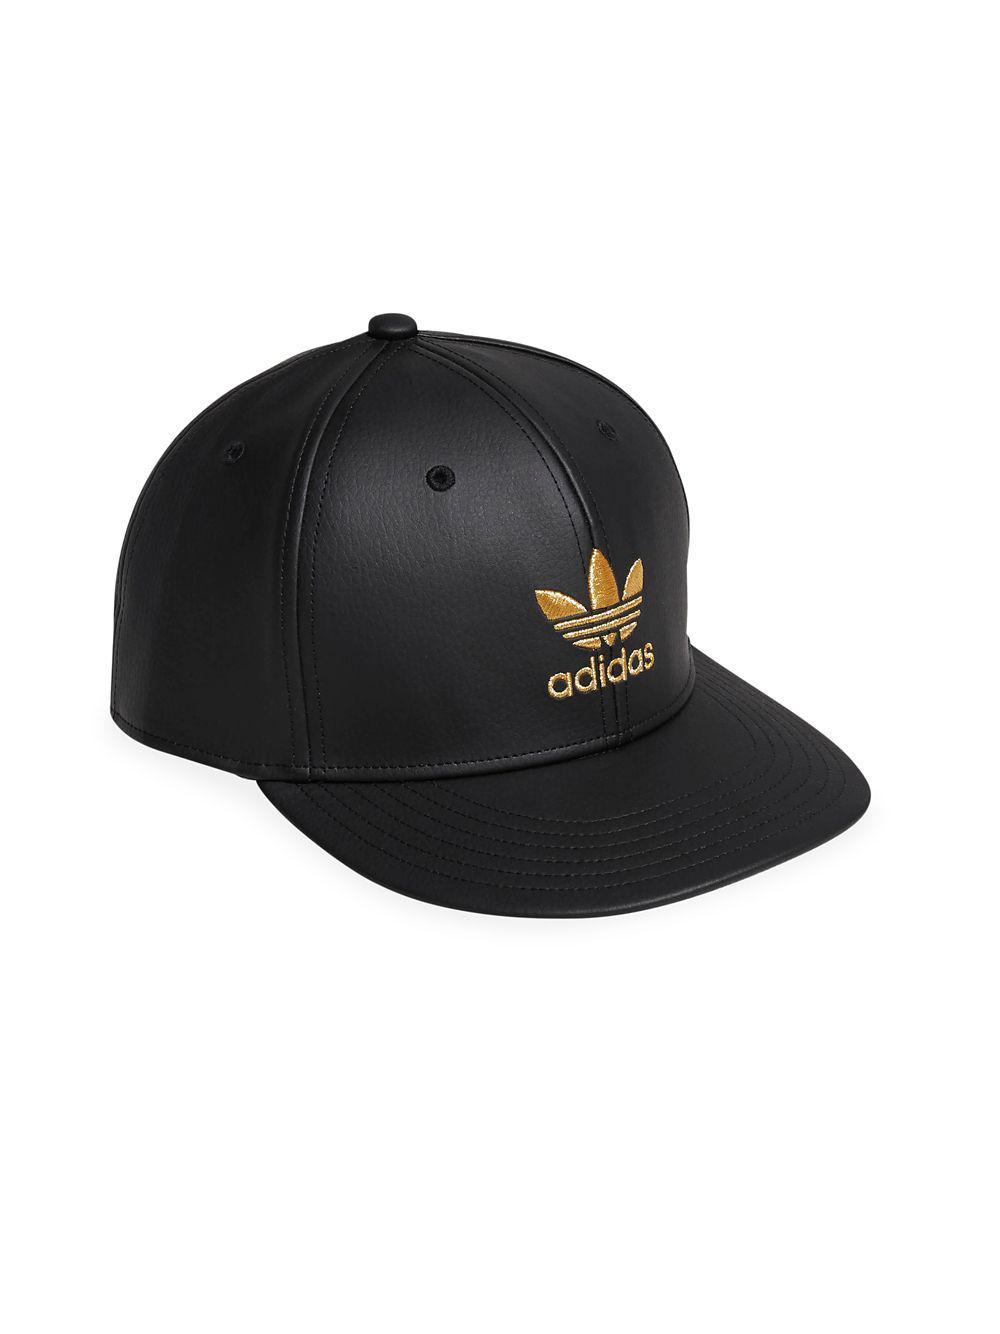 05dfed5649fdc8 adidas Originals Trefoil Mixed Baseball Cap in Black for Men - Lyst